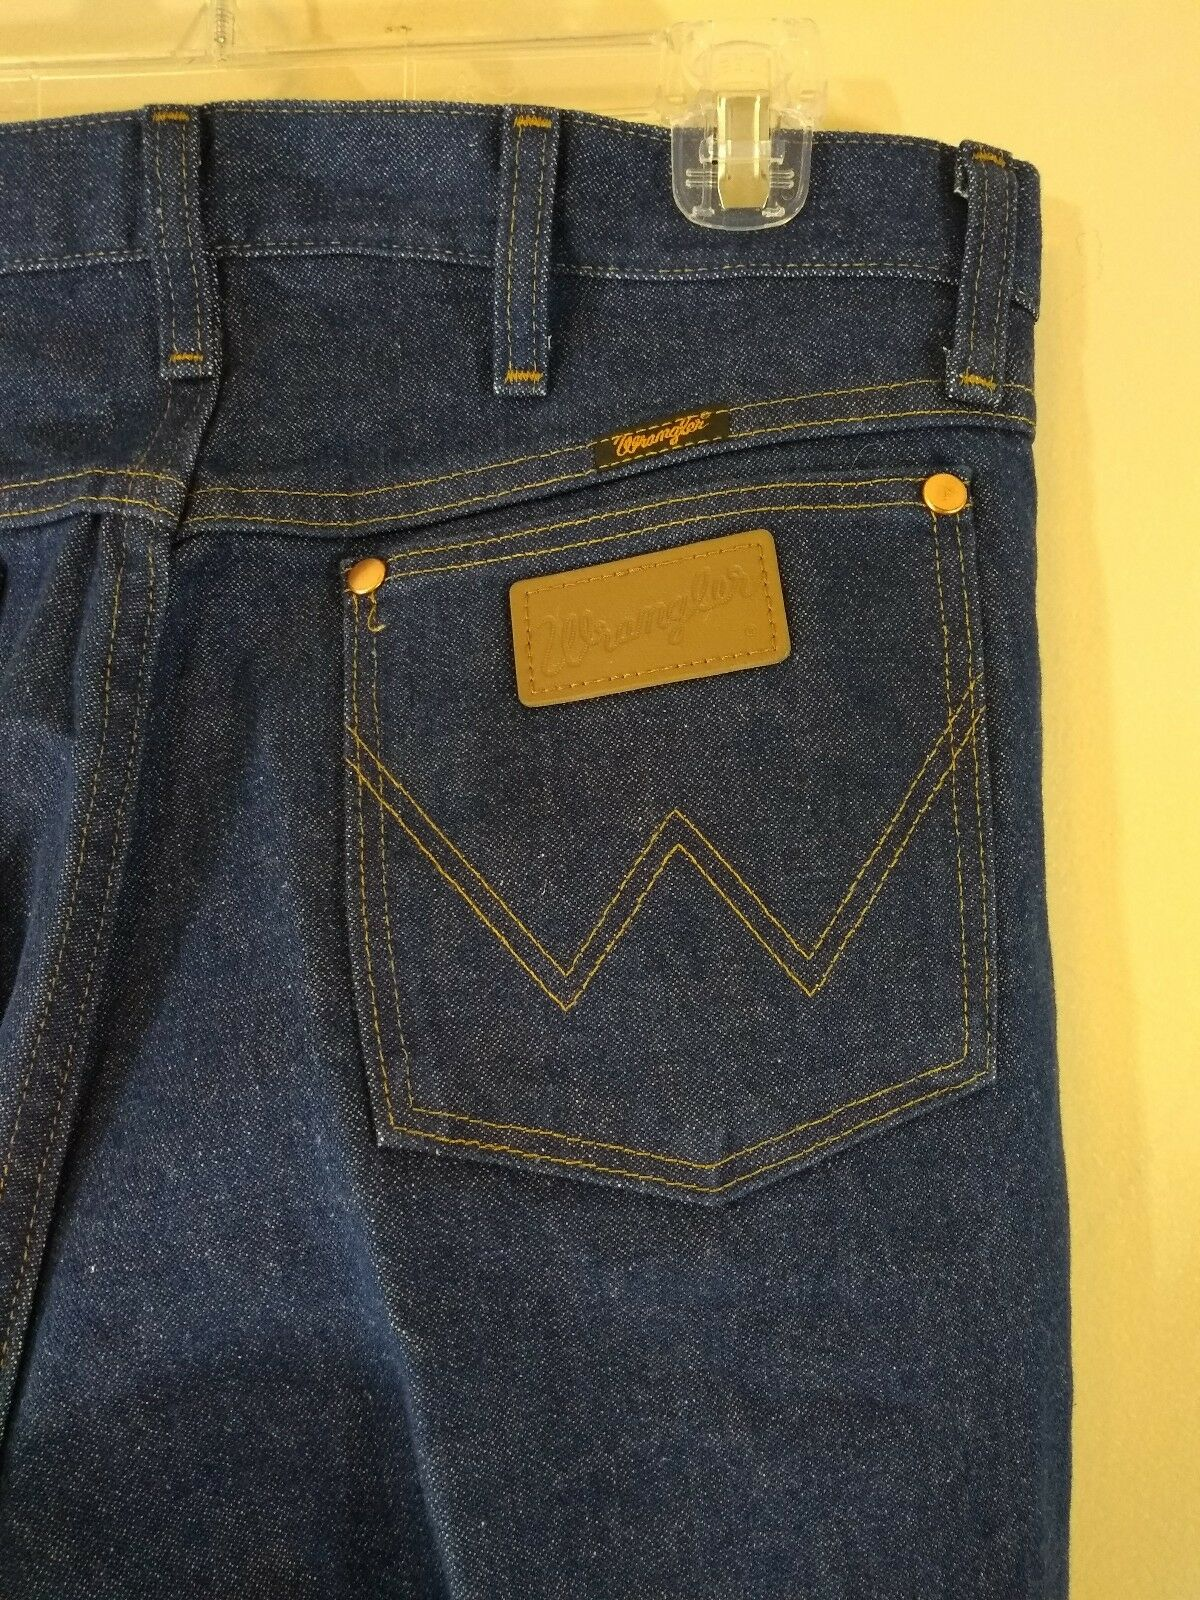 Mens WRANGLER Jeans 34x44 Straight Leg 100% Cotton Vintage